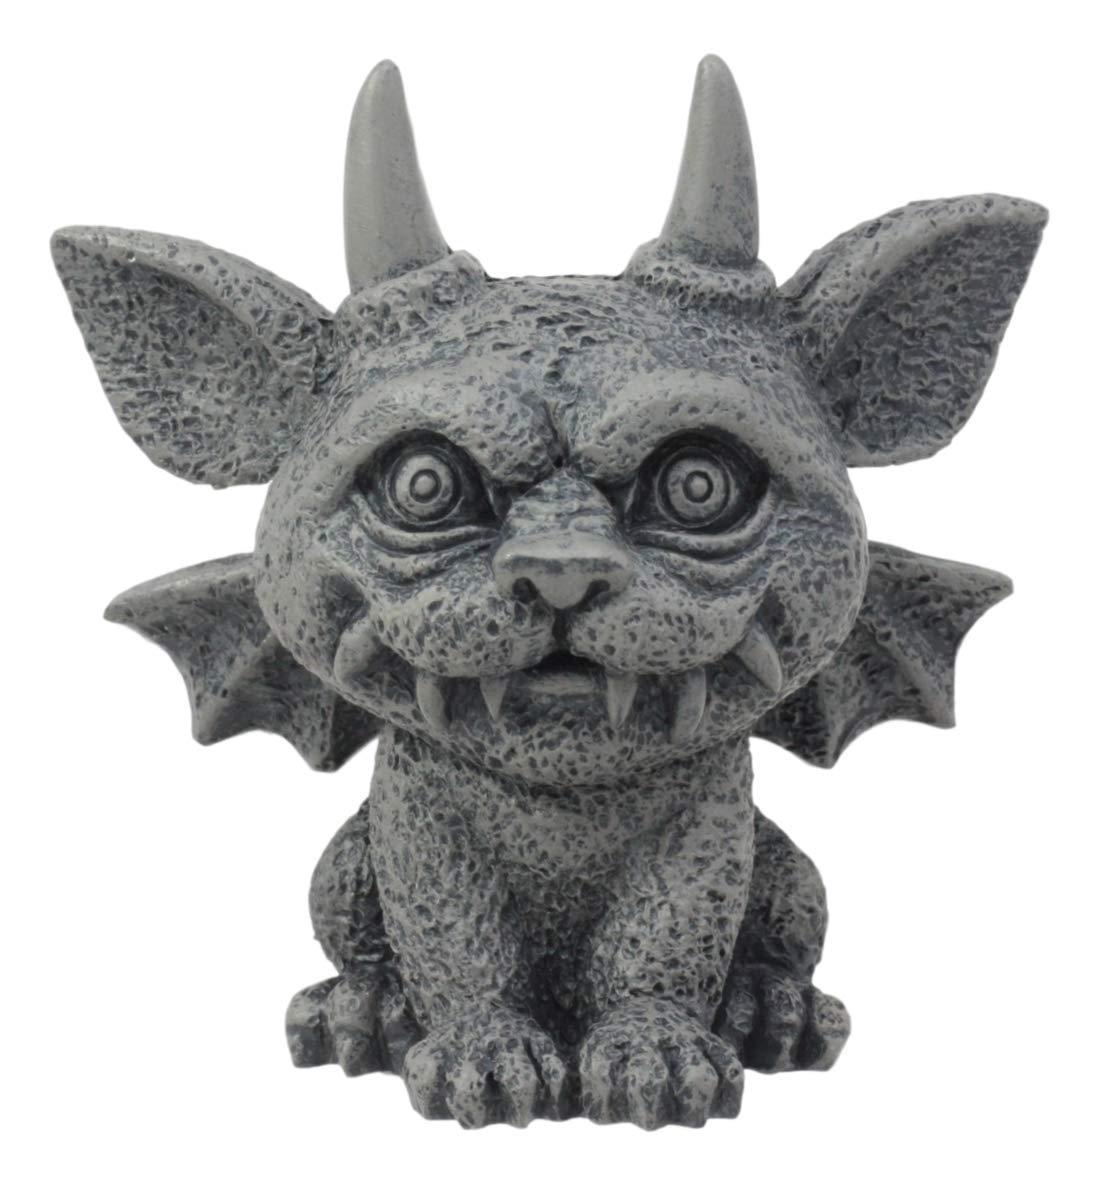 "Ebros Gothic Horned Bat Cat Gargoyle Bast Figurine Small Mythical Fantasy Decor Statue 3.25"" Tall As Talisman of Protection Fairy Garden Accessory DIY Renaissance Or Medieval Collectible"